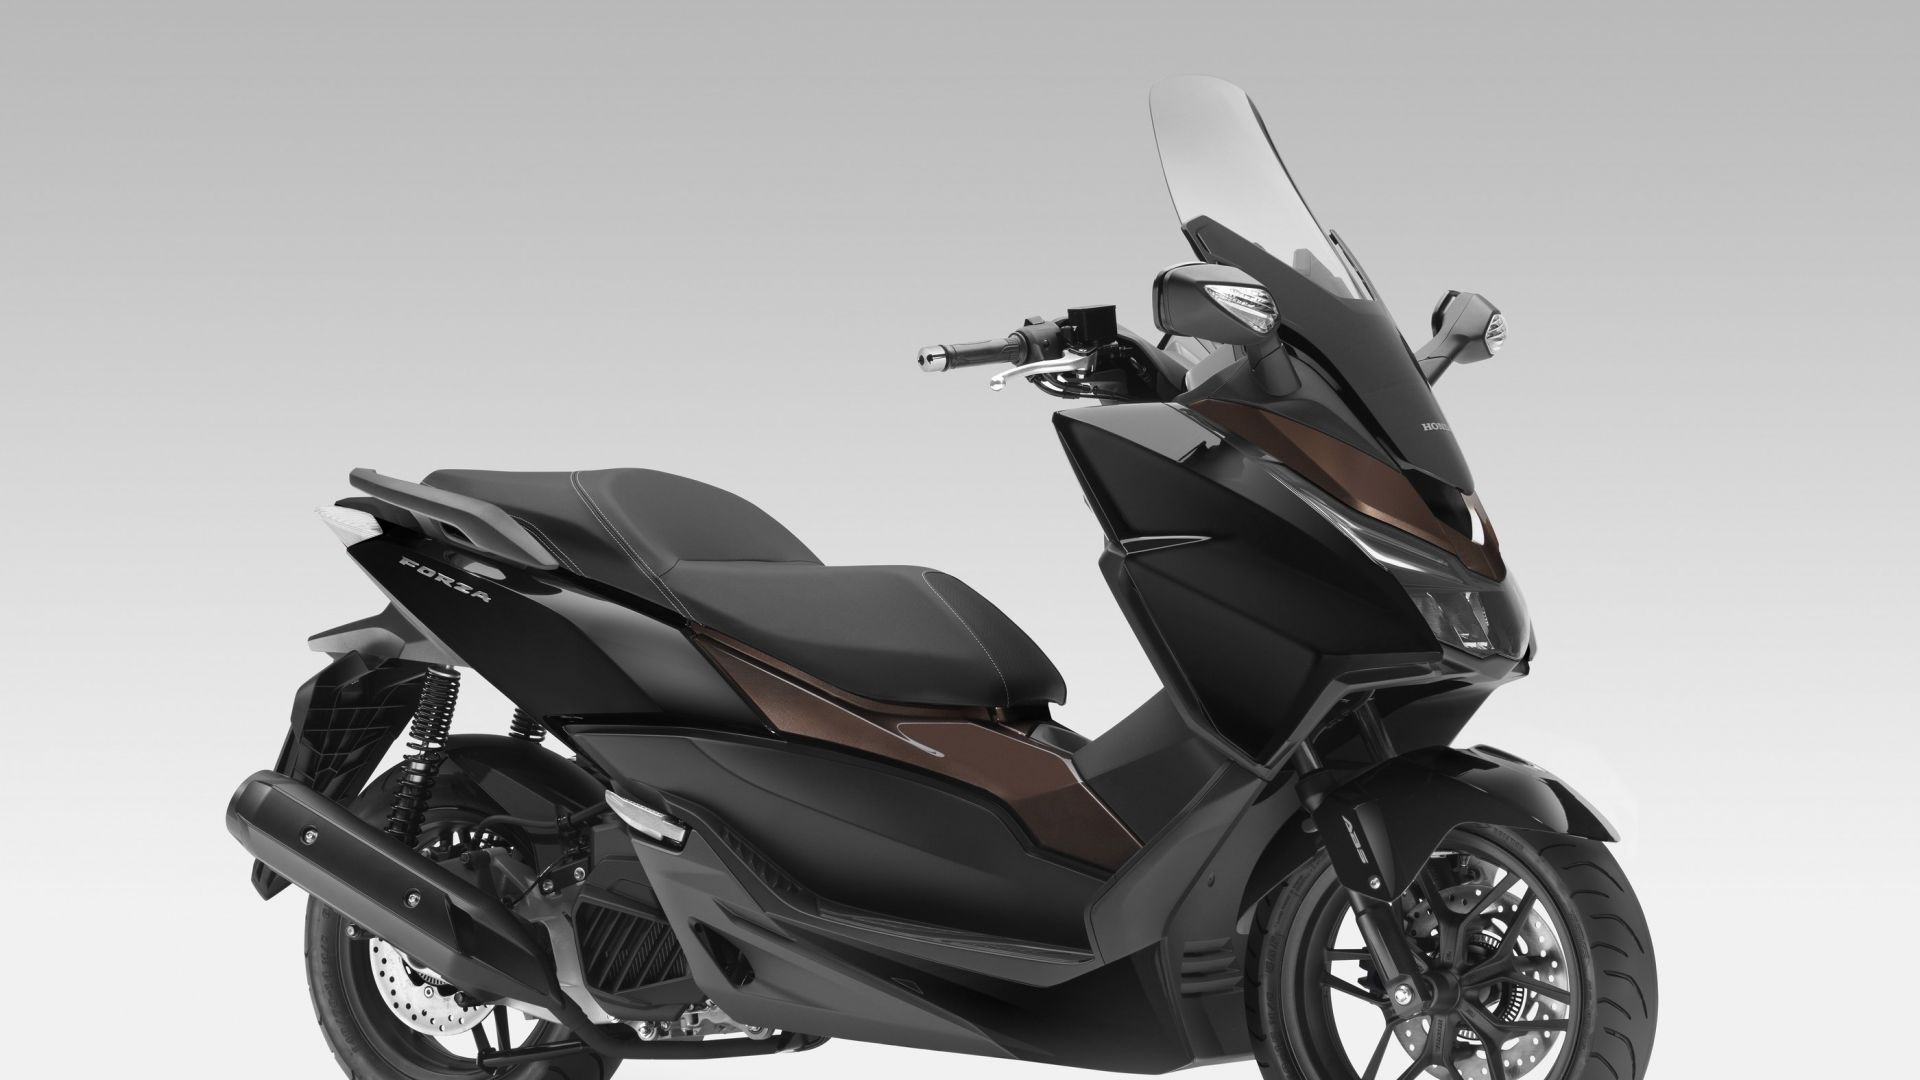 novit scooter honda forza 125 motorbox. Black Bedroom Furniture Sets. Home Design Ideas